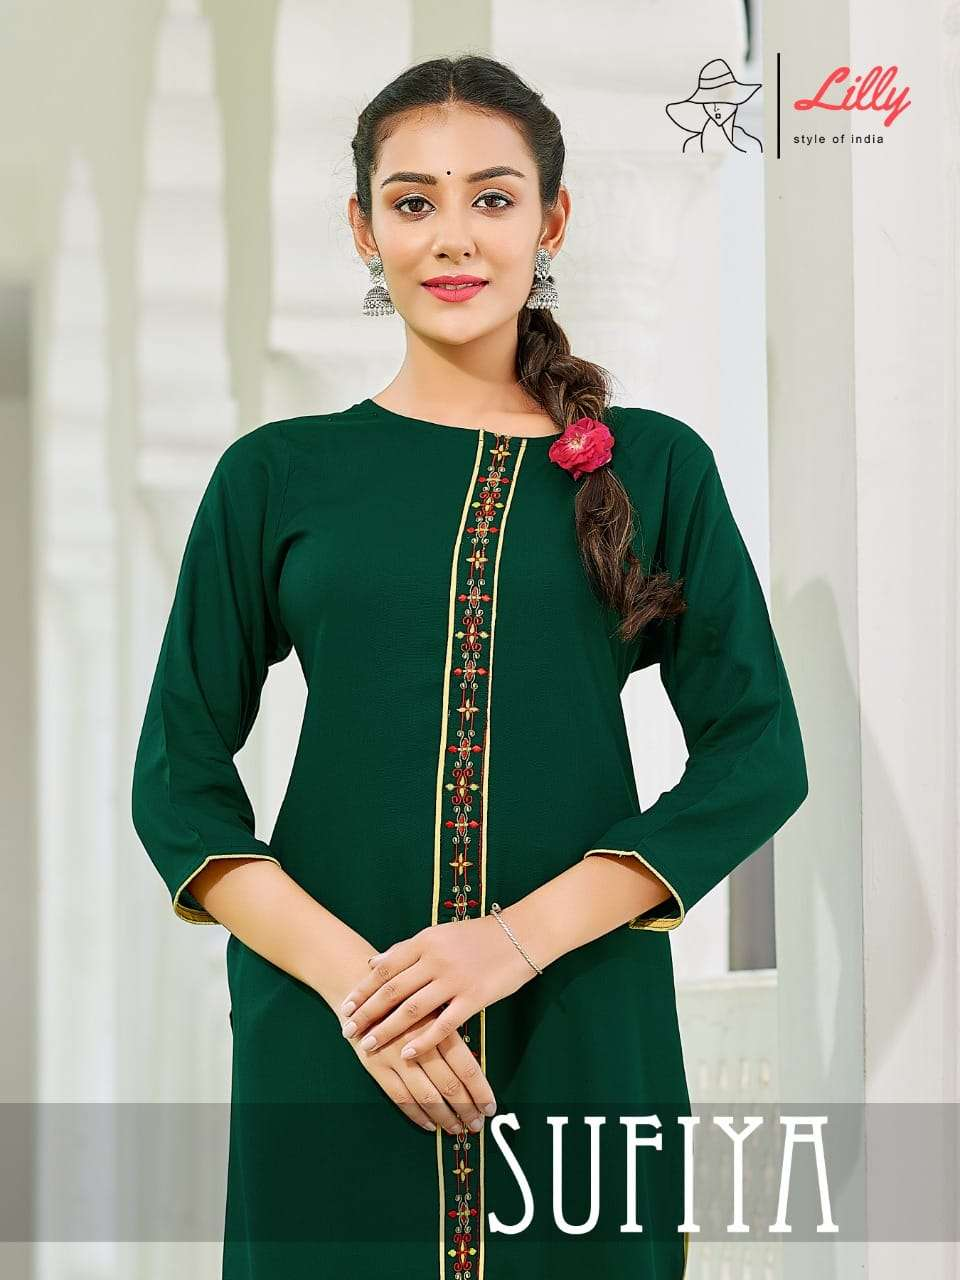 Lilly Sufiya Fancy Rayon Kurti pant Set new Catalog Wholesaler